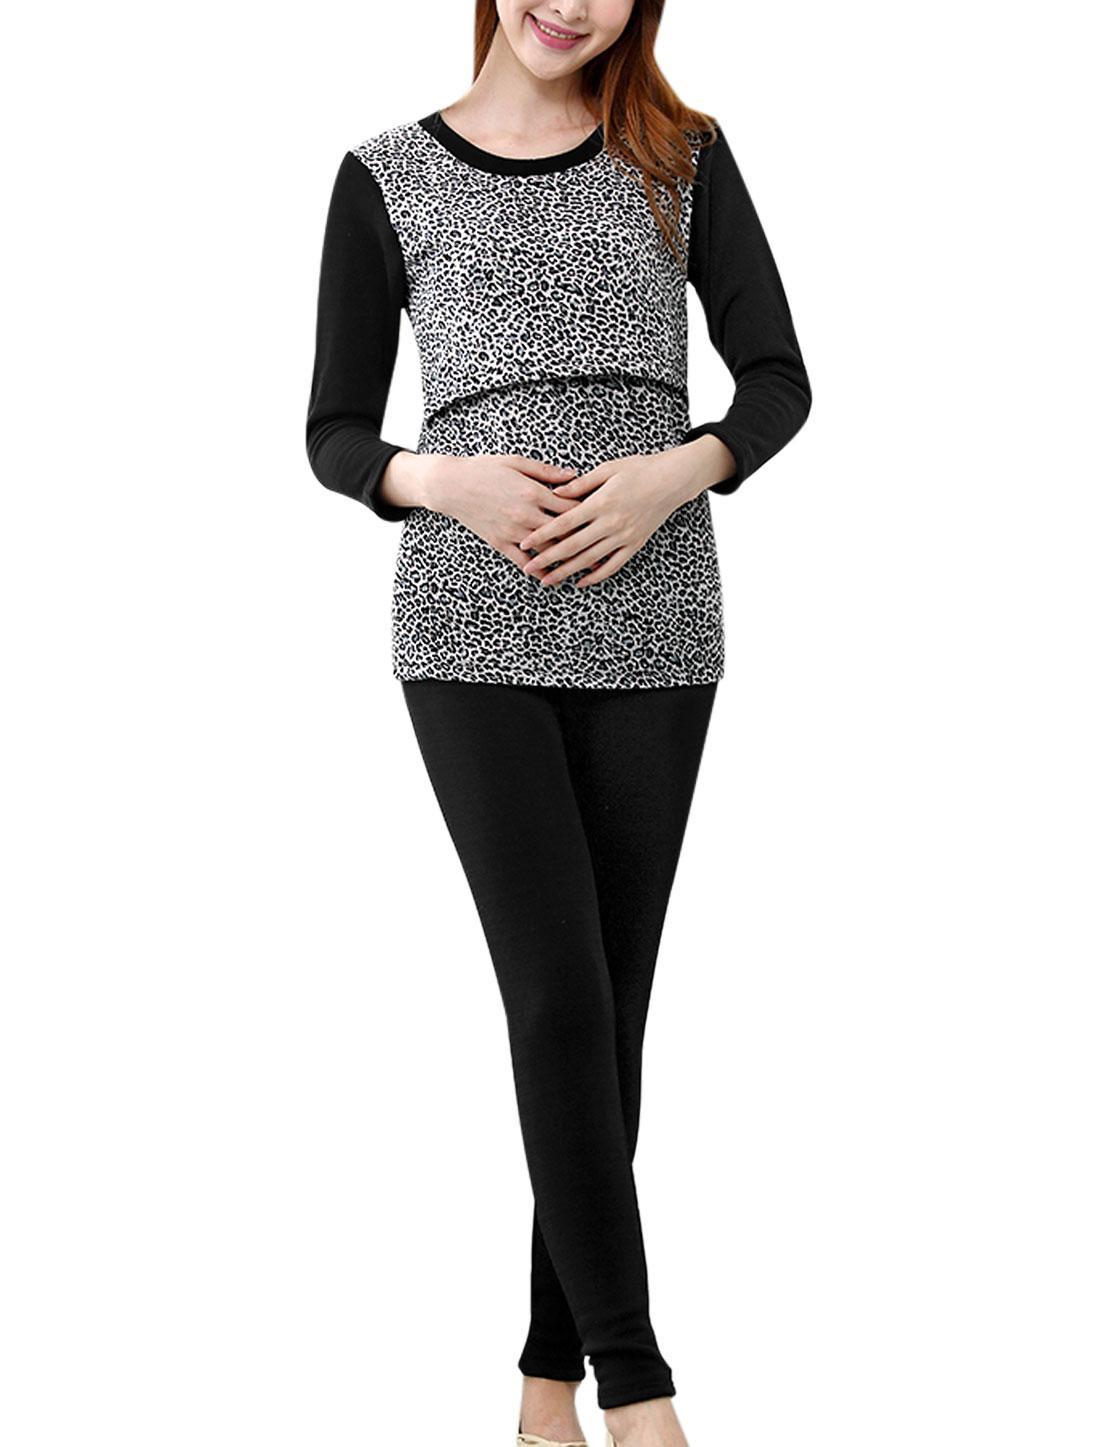 Maternity Leopard Print Soft Top w Fleece Lined Warm Pants Pajama Sets Black XS